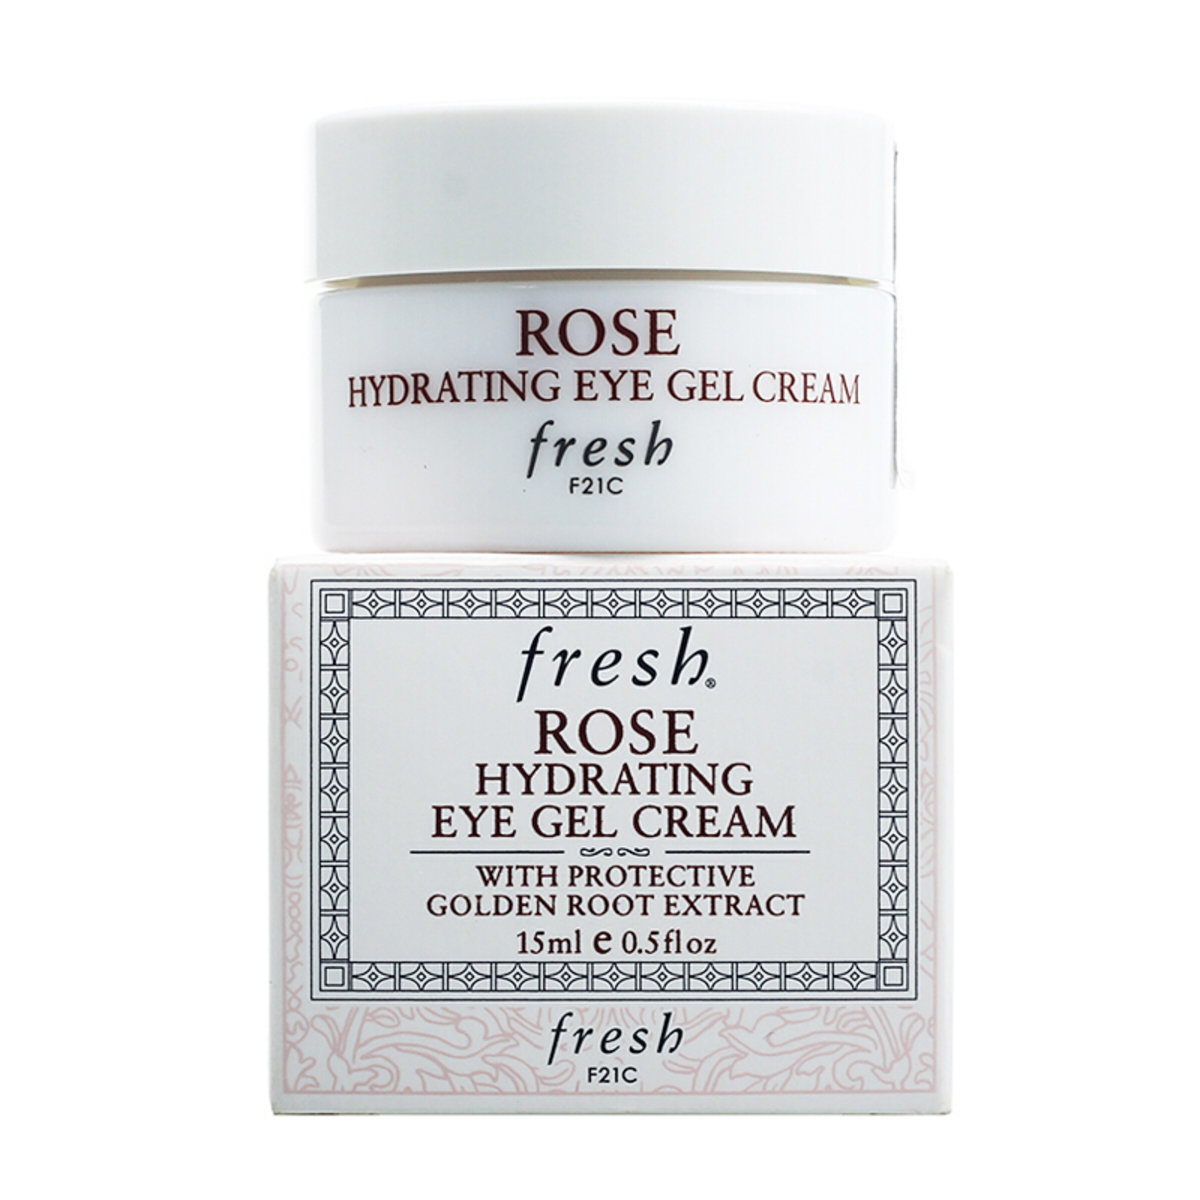 Rose Hydrating Eye Gel Cream 15ml(Parallel Import)